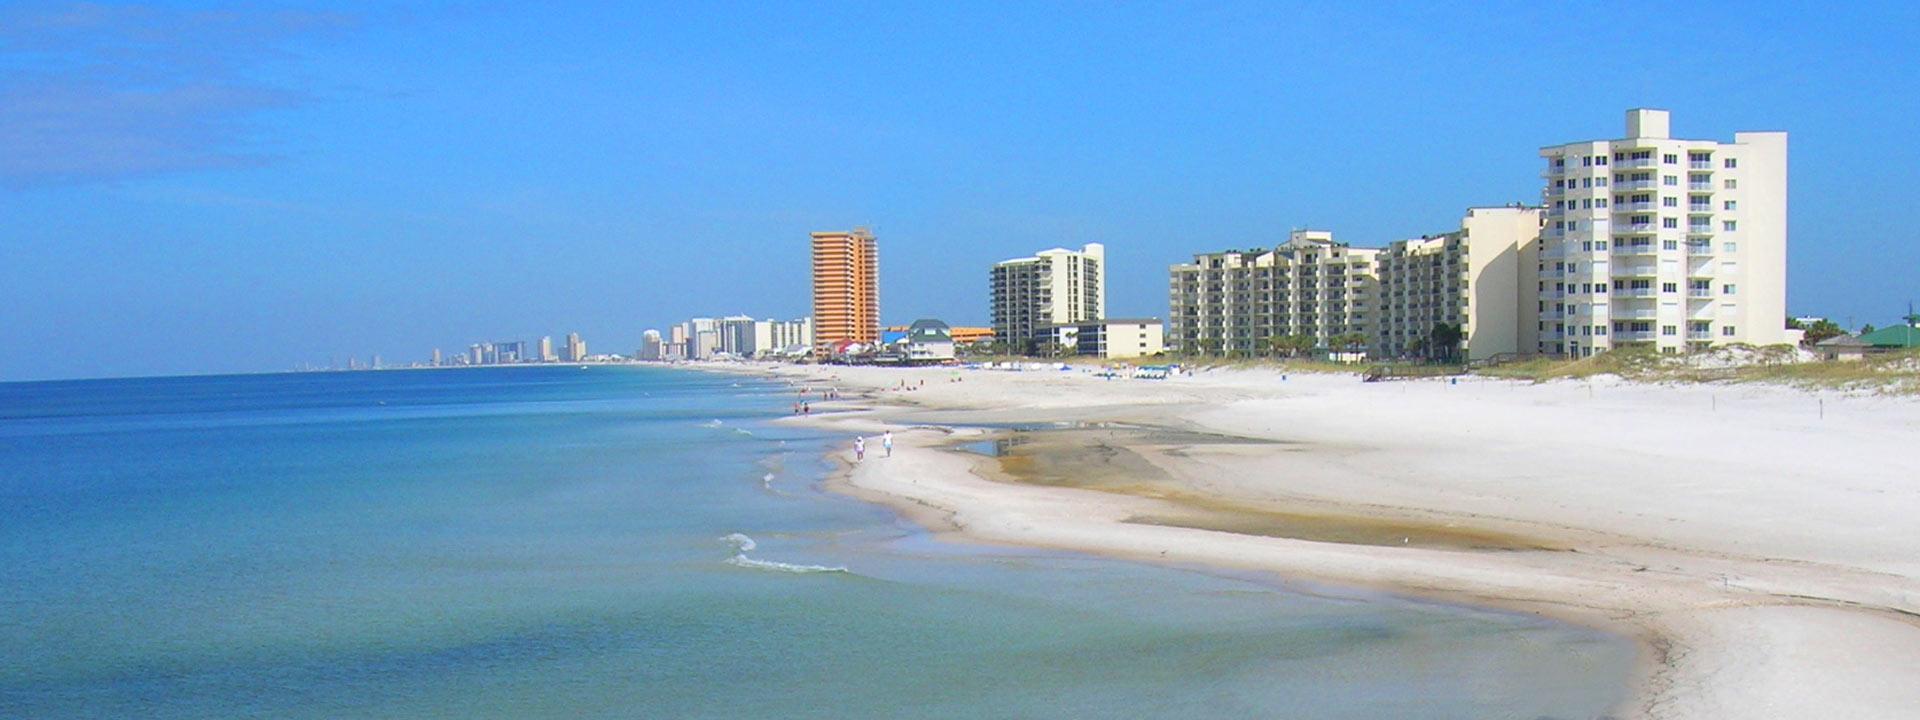 Panama City Public Beach Access